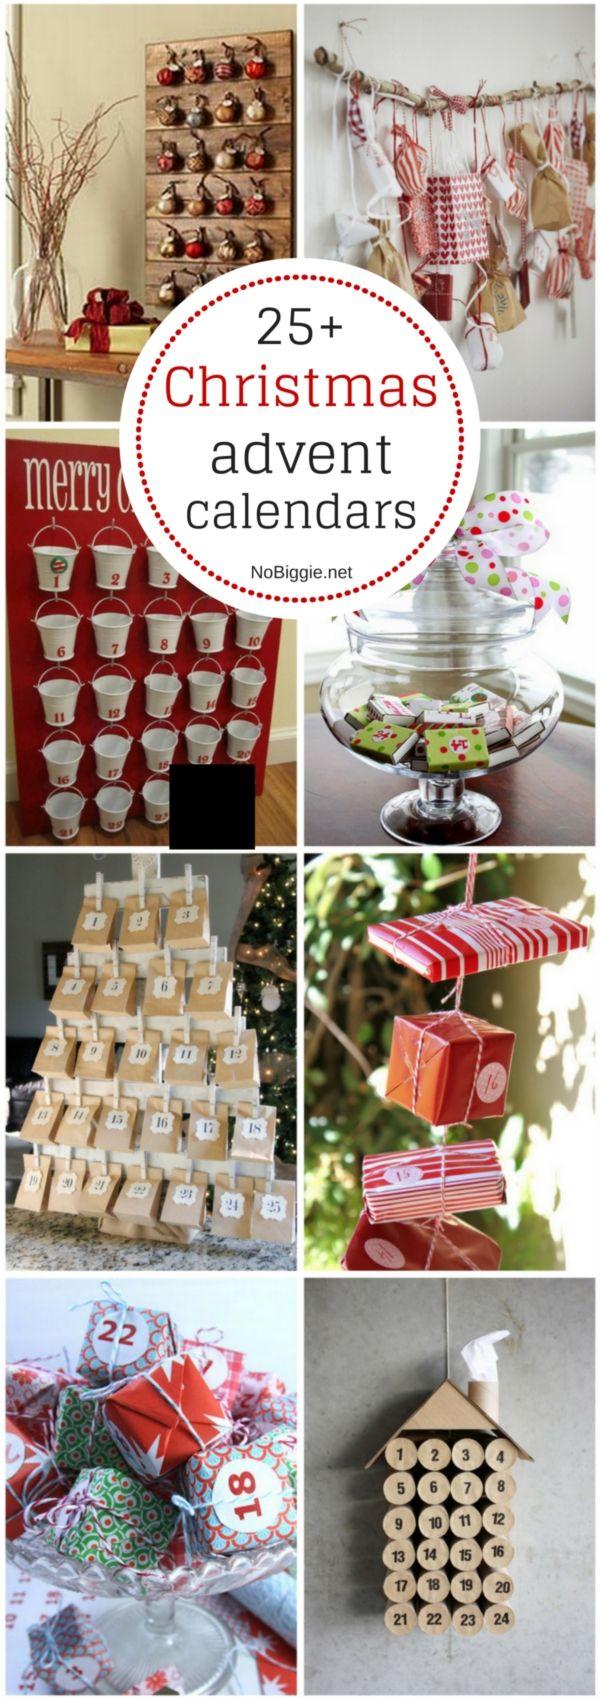 25+ Christmas advent calendars - NoBiggie.net best christmas lights tumblr…